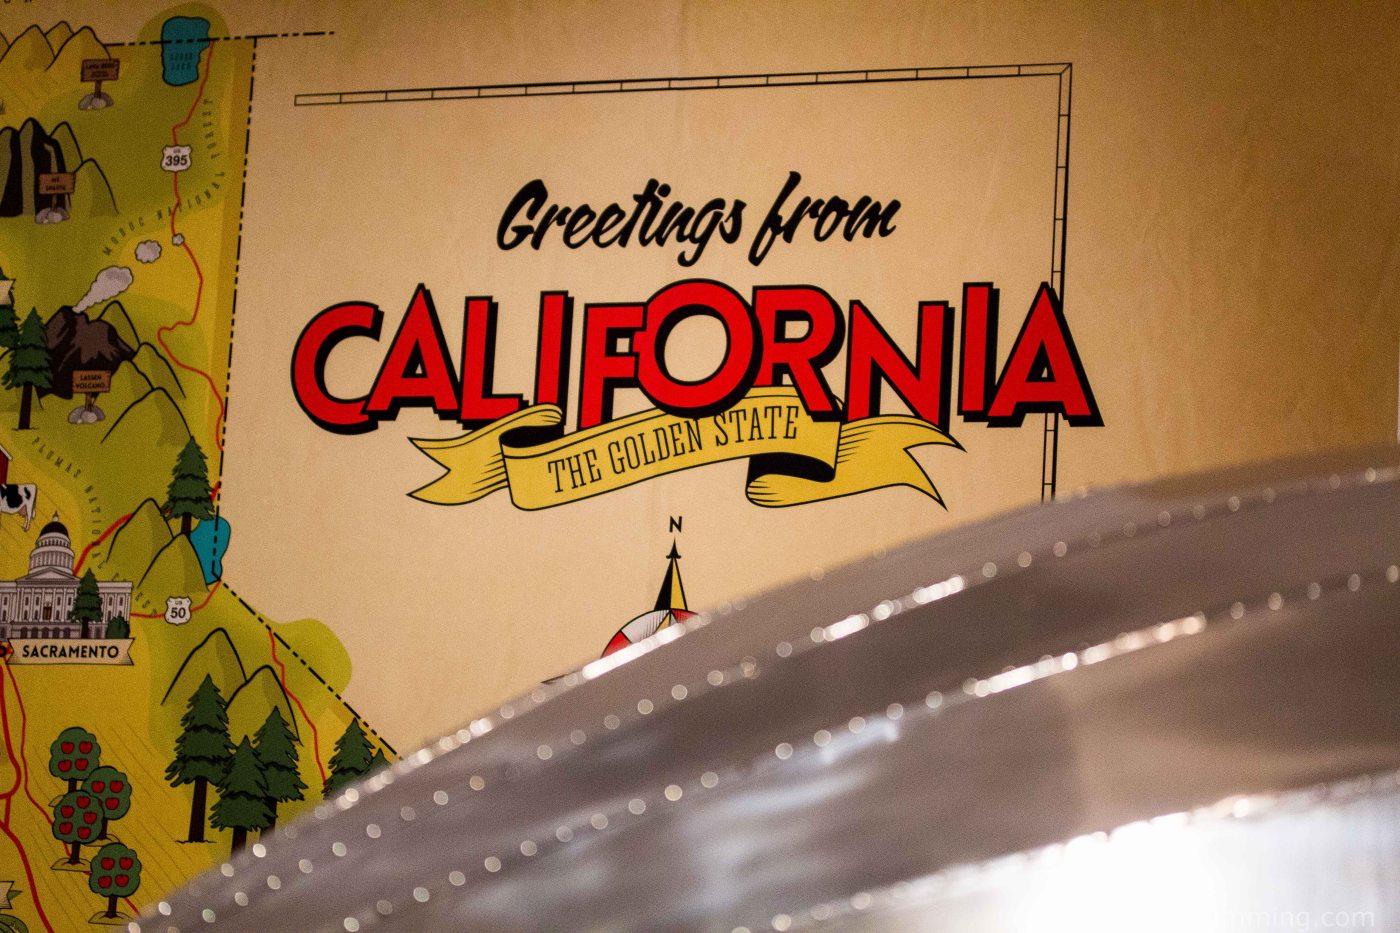 California Design Up Late-1321